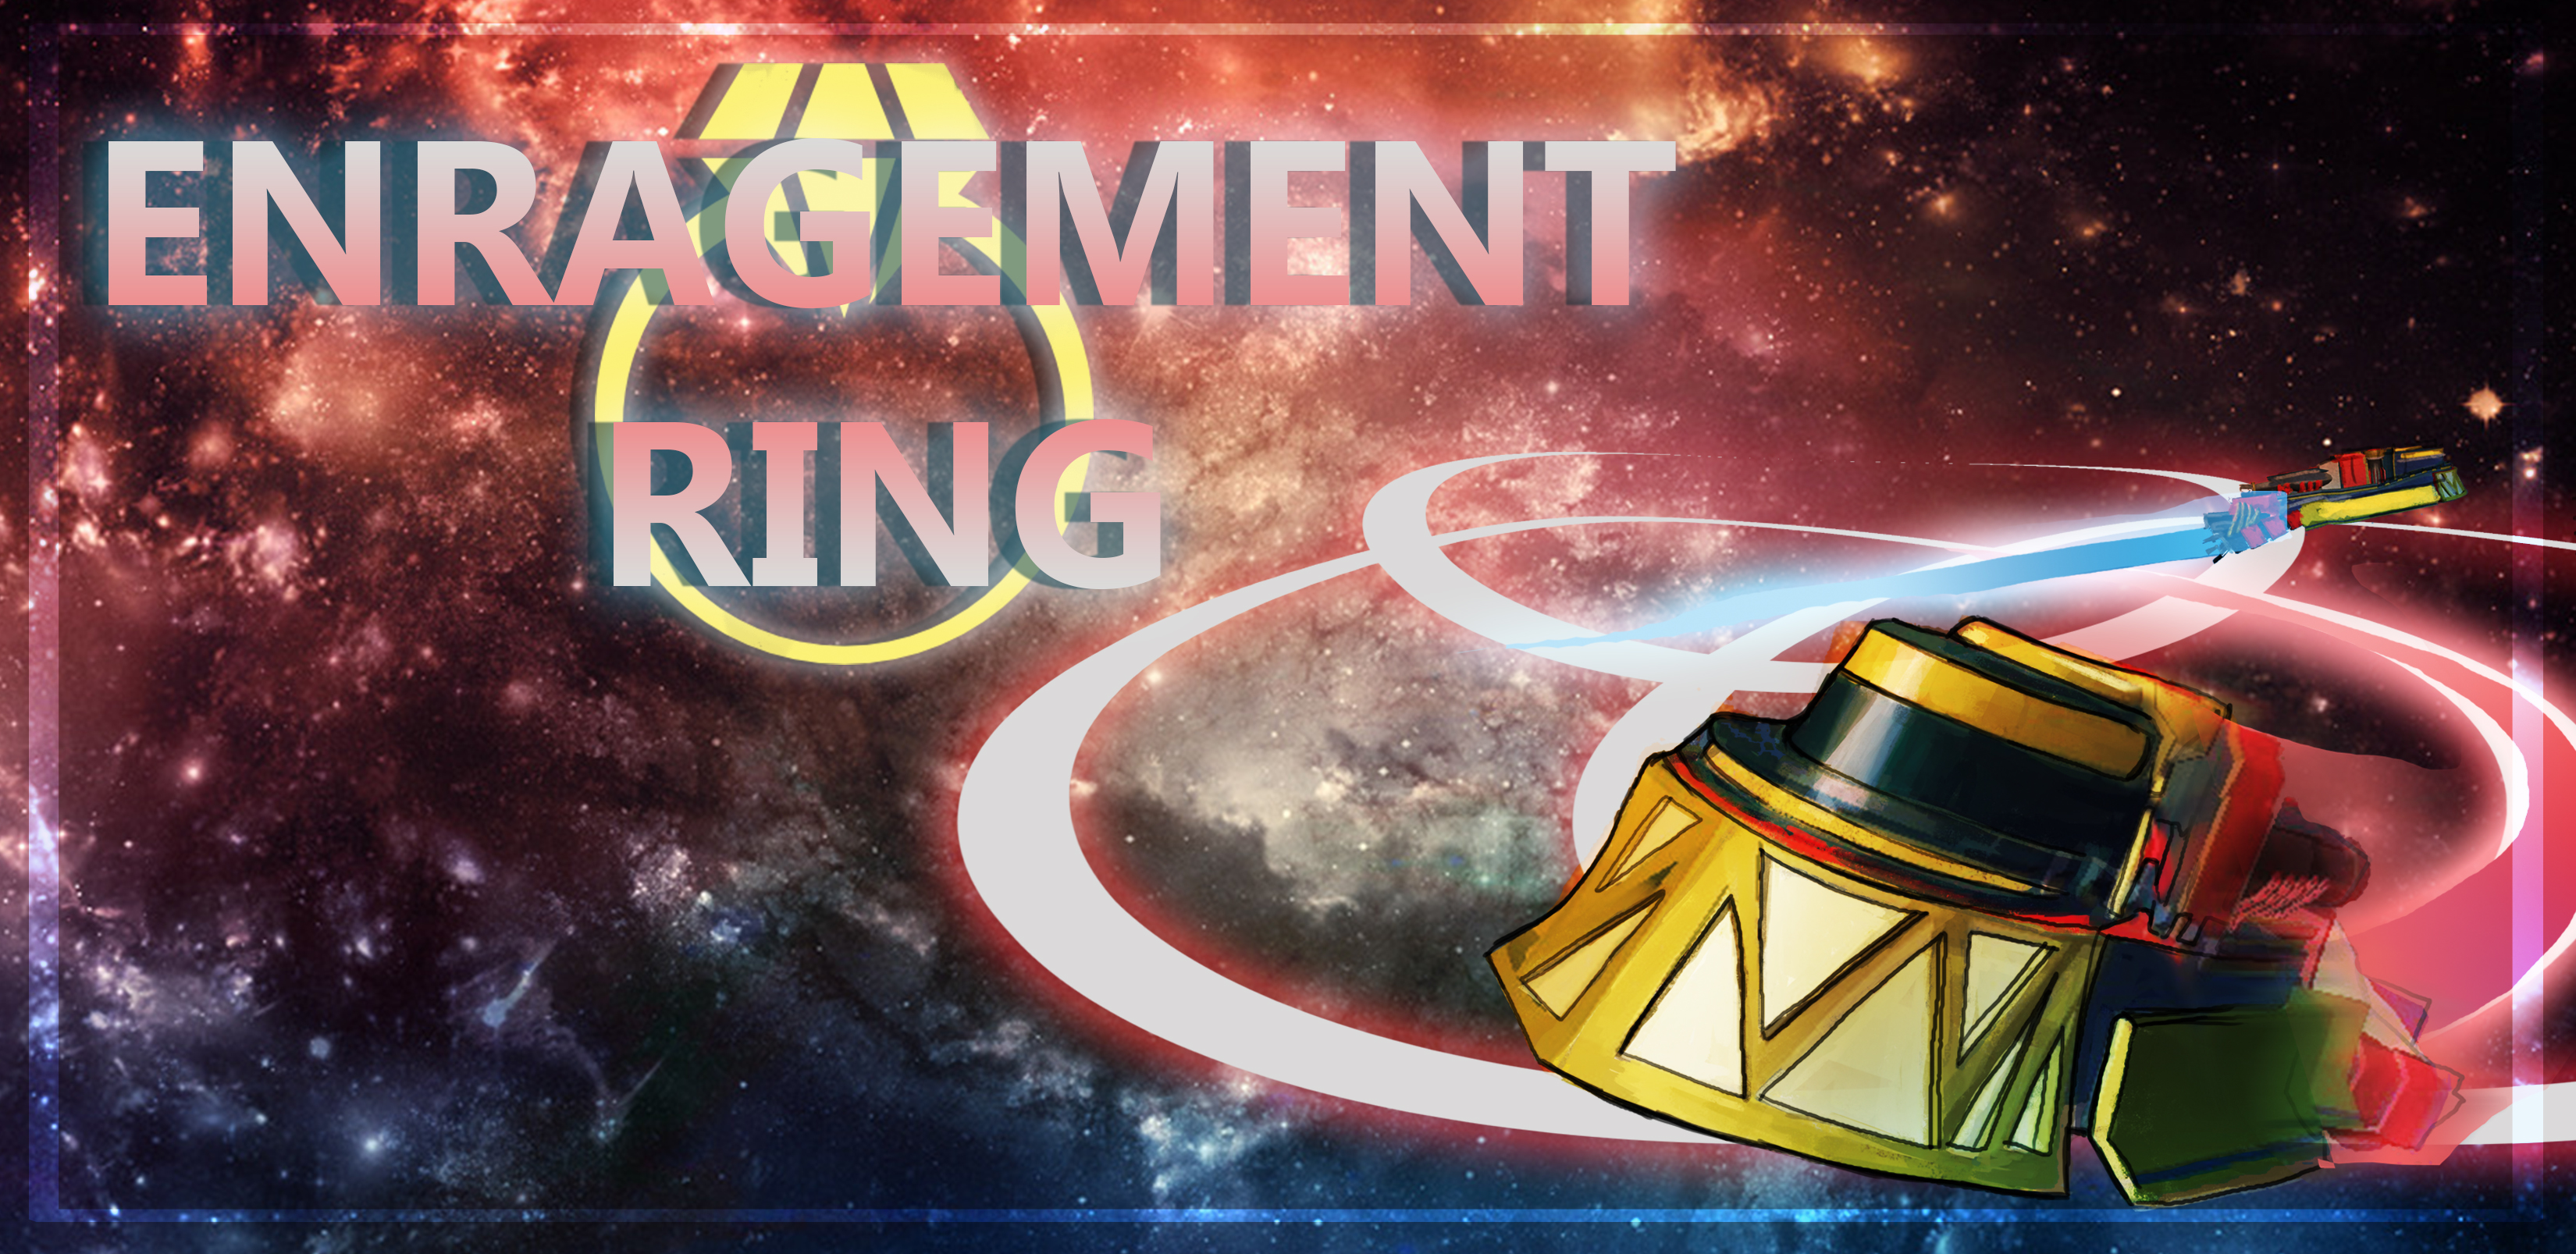 The Enragement Ring